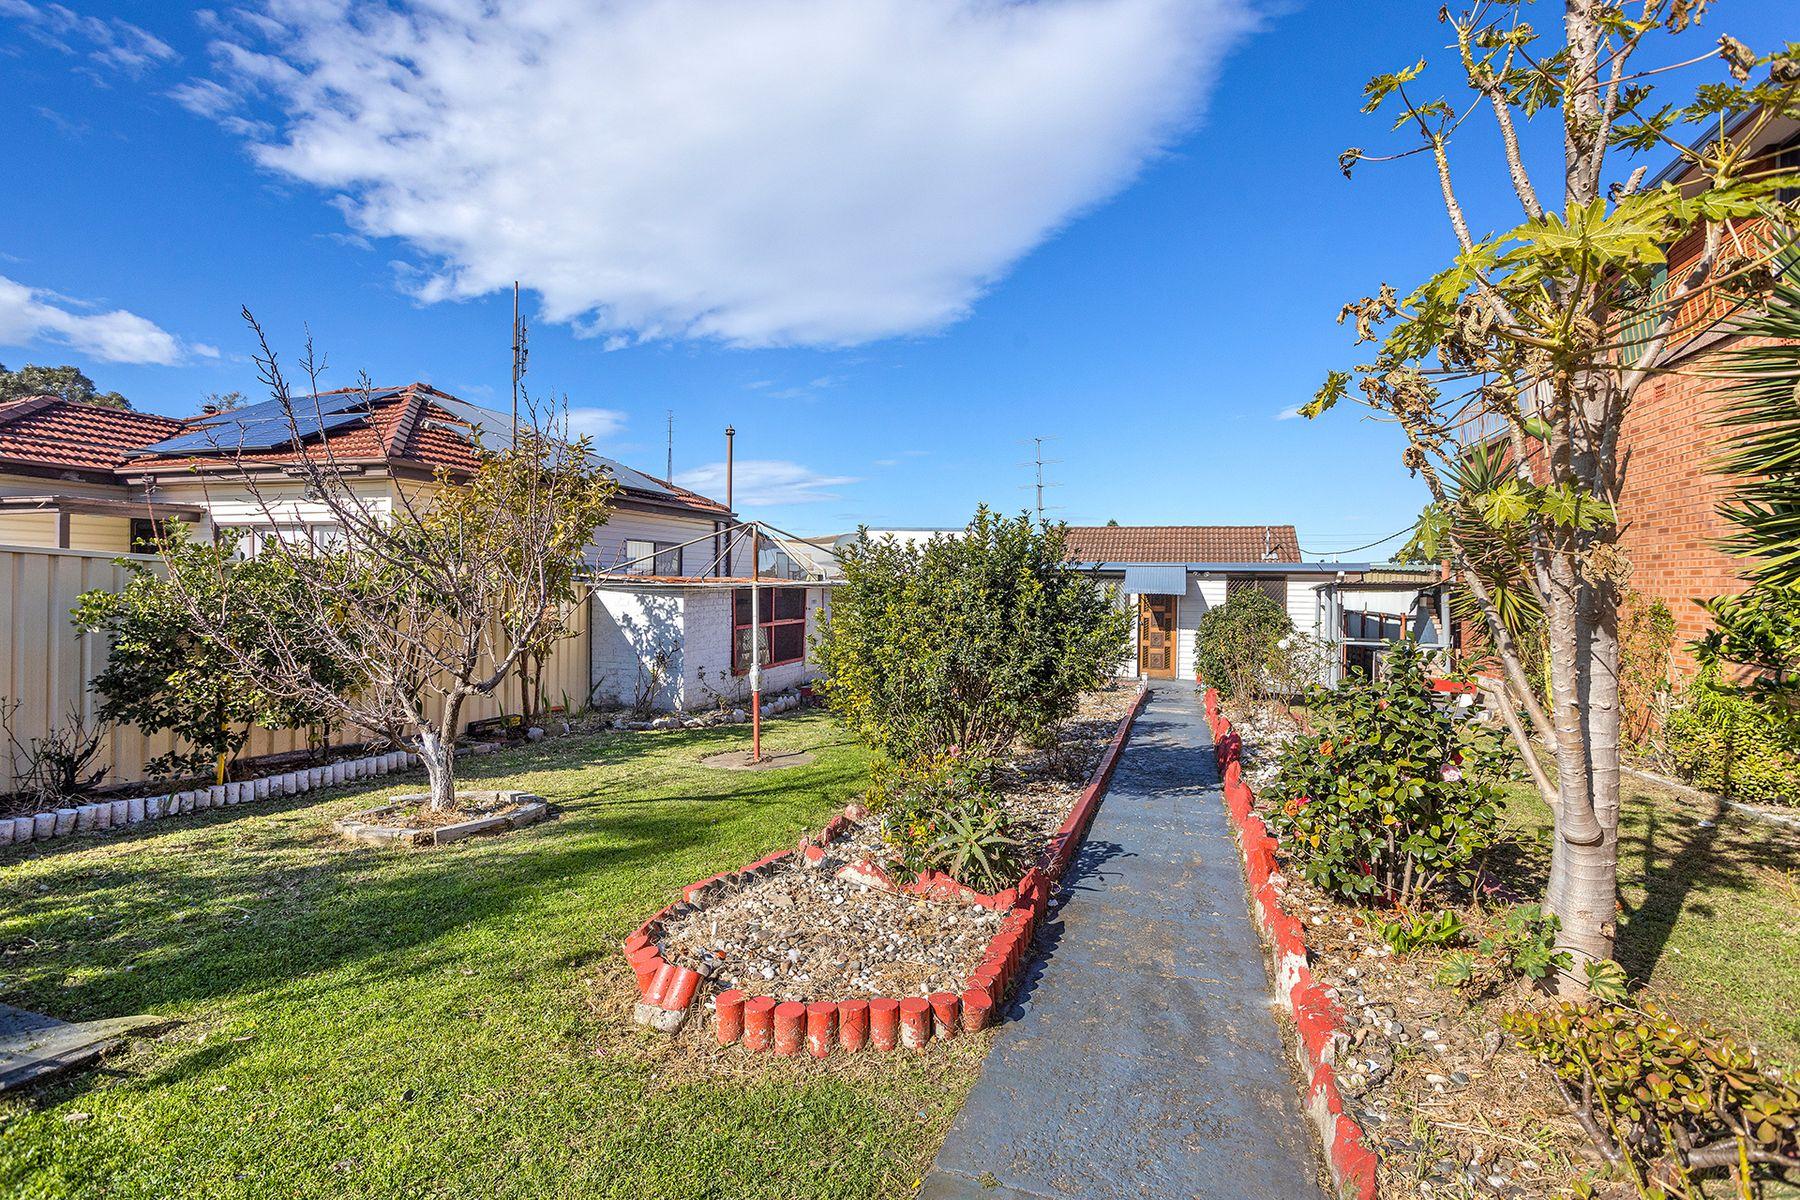 107 Flagstaff Road, Warrawong, NSW 2502